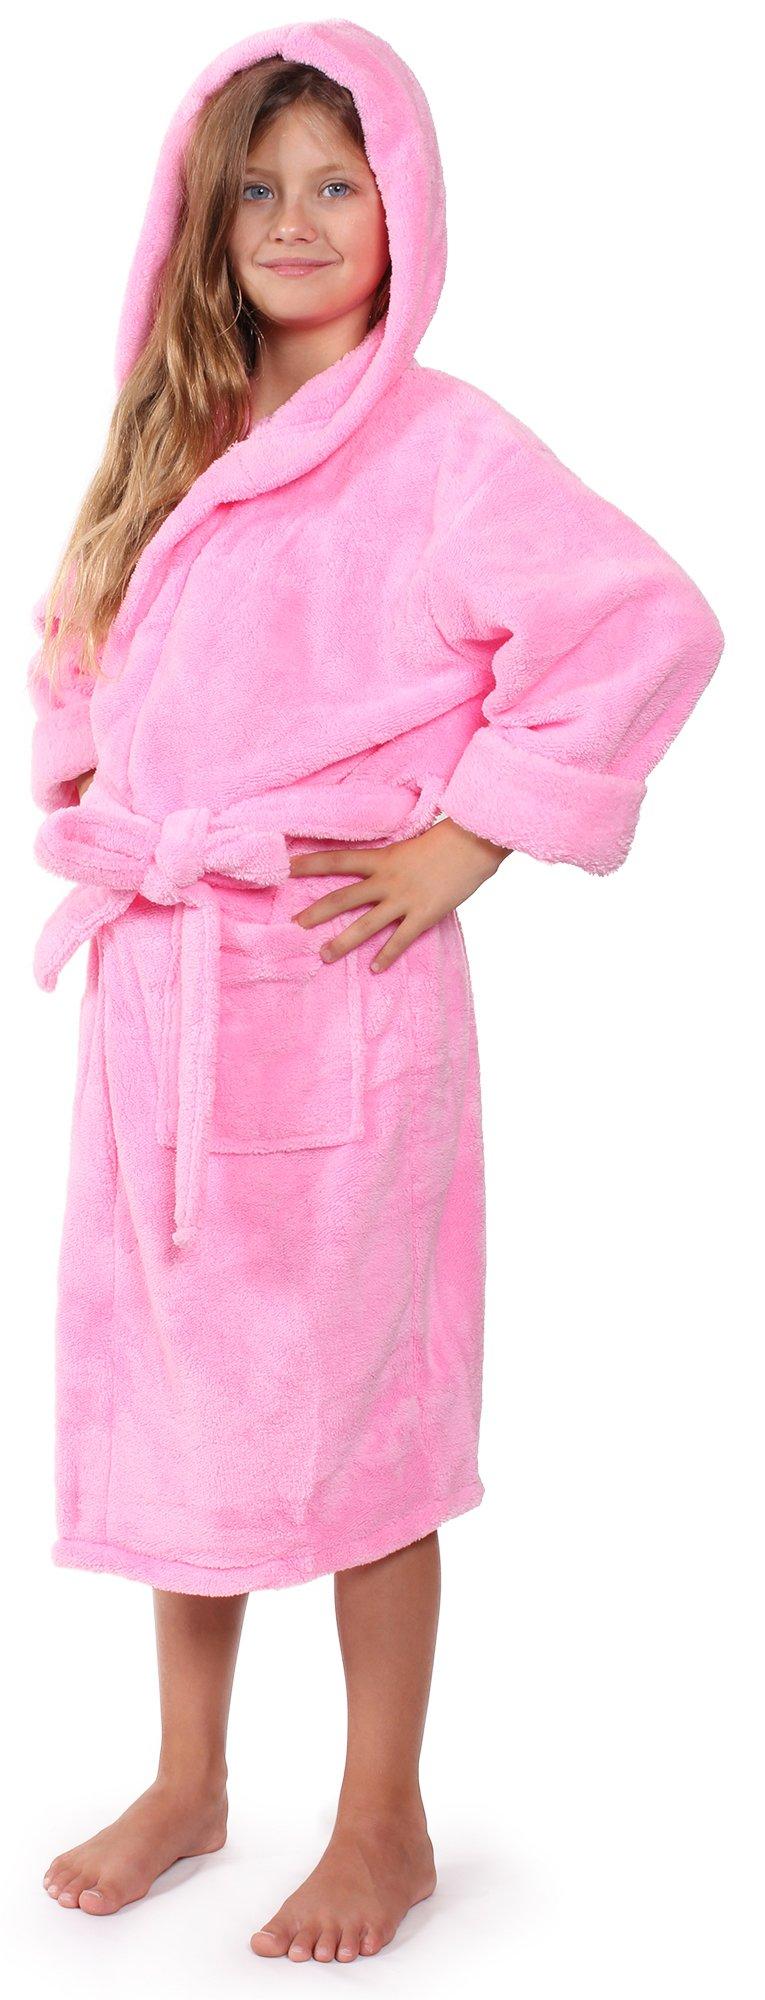 Indulge Girls Robe, Kids Hooded Soft and Plush Bathrobe, Made in Turkey (Pink, Large)